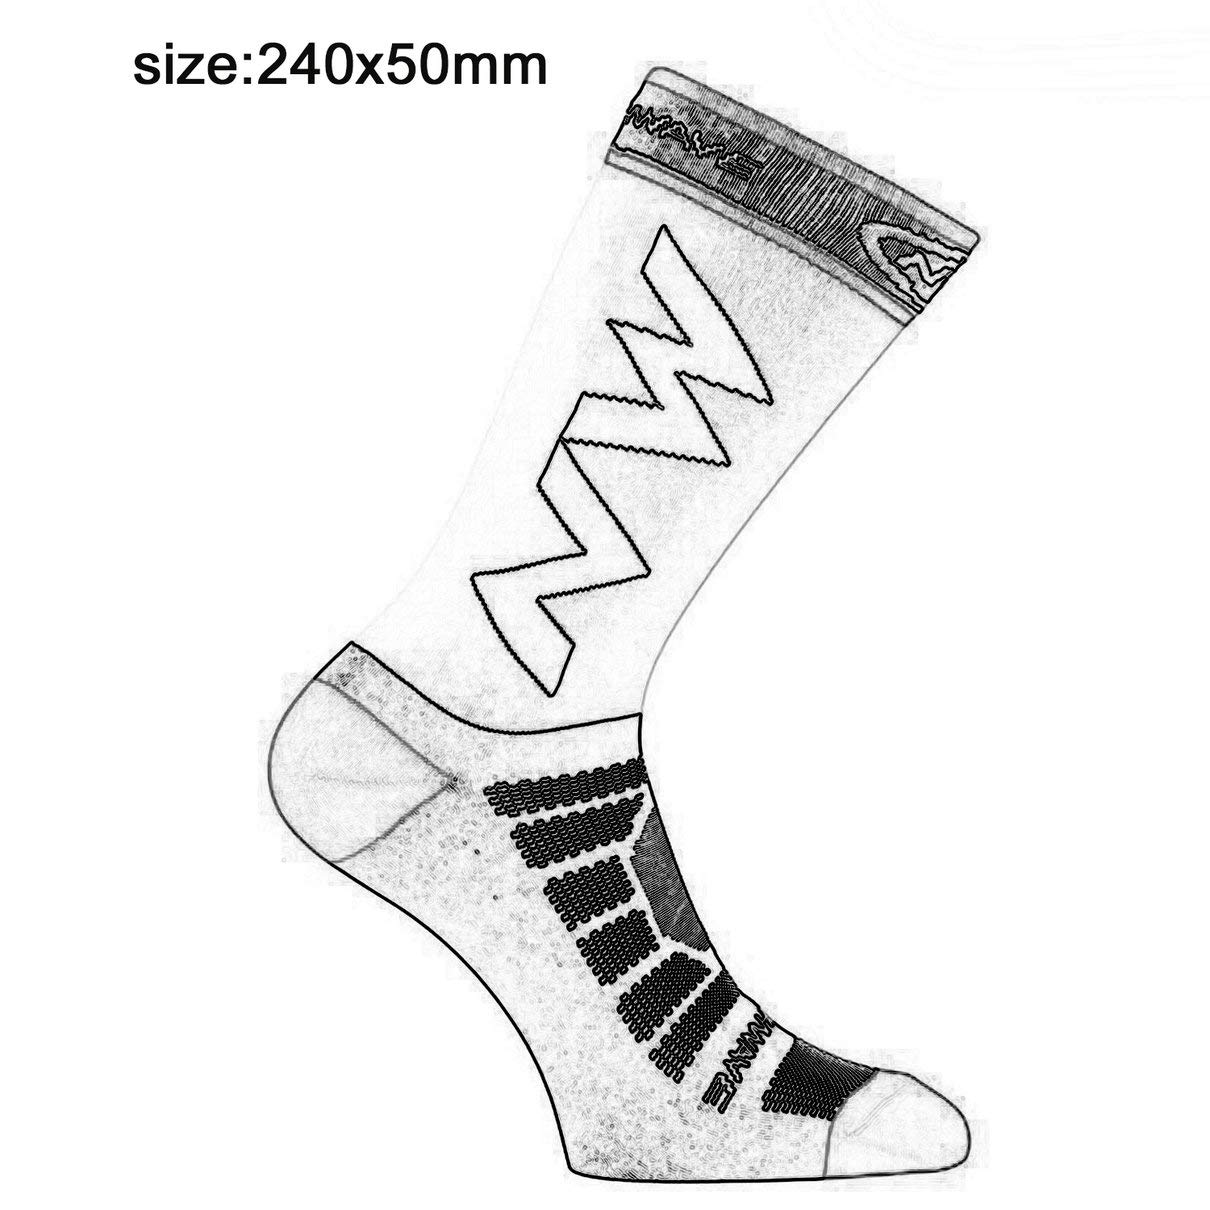 Togames Calcetines Largos de compresi/ón para Hombres Adultos Transpirables Calcetines de f/útbol c/álidos Baloncesto Deportes Antideslizante Ciclismo Escalada Correr Calcetines